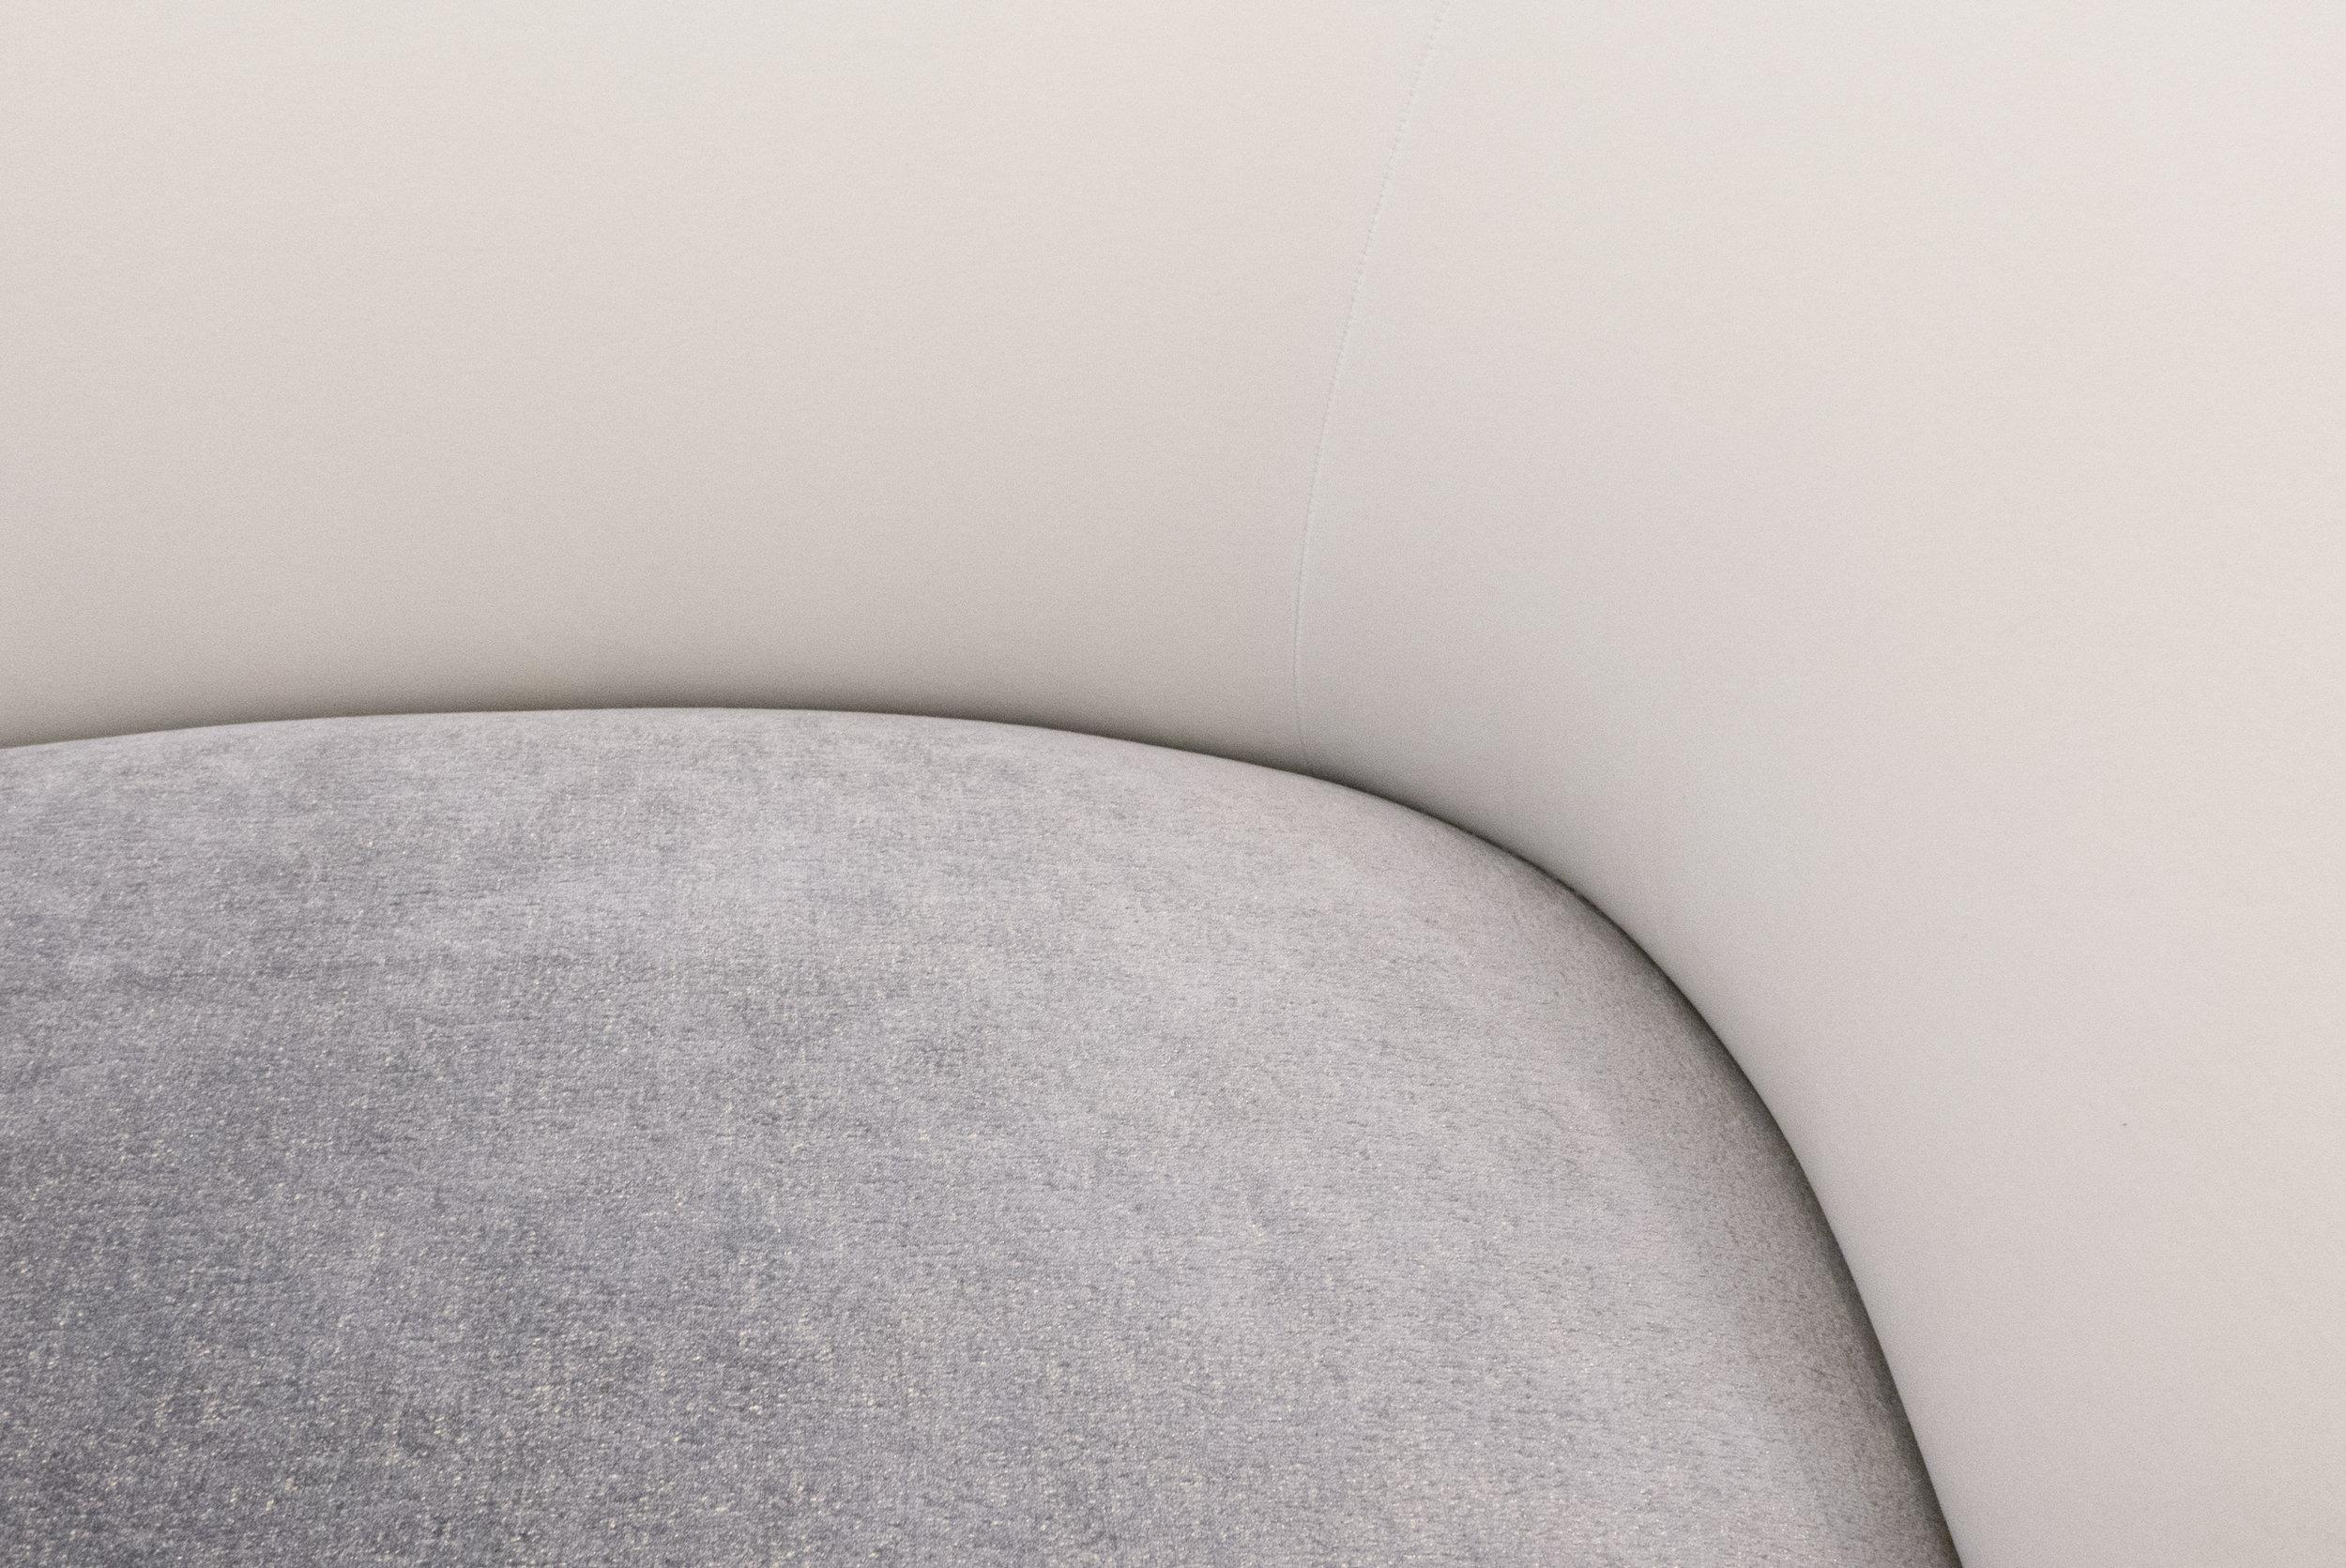 Vladimir Kagan, 'Cloud' Sofa, c. 1970 - 1979, Wood, Dedar Milano Upholstery, 32.5 H x 98 W x 16 D incehs_6.jpg